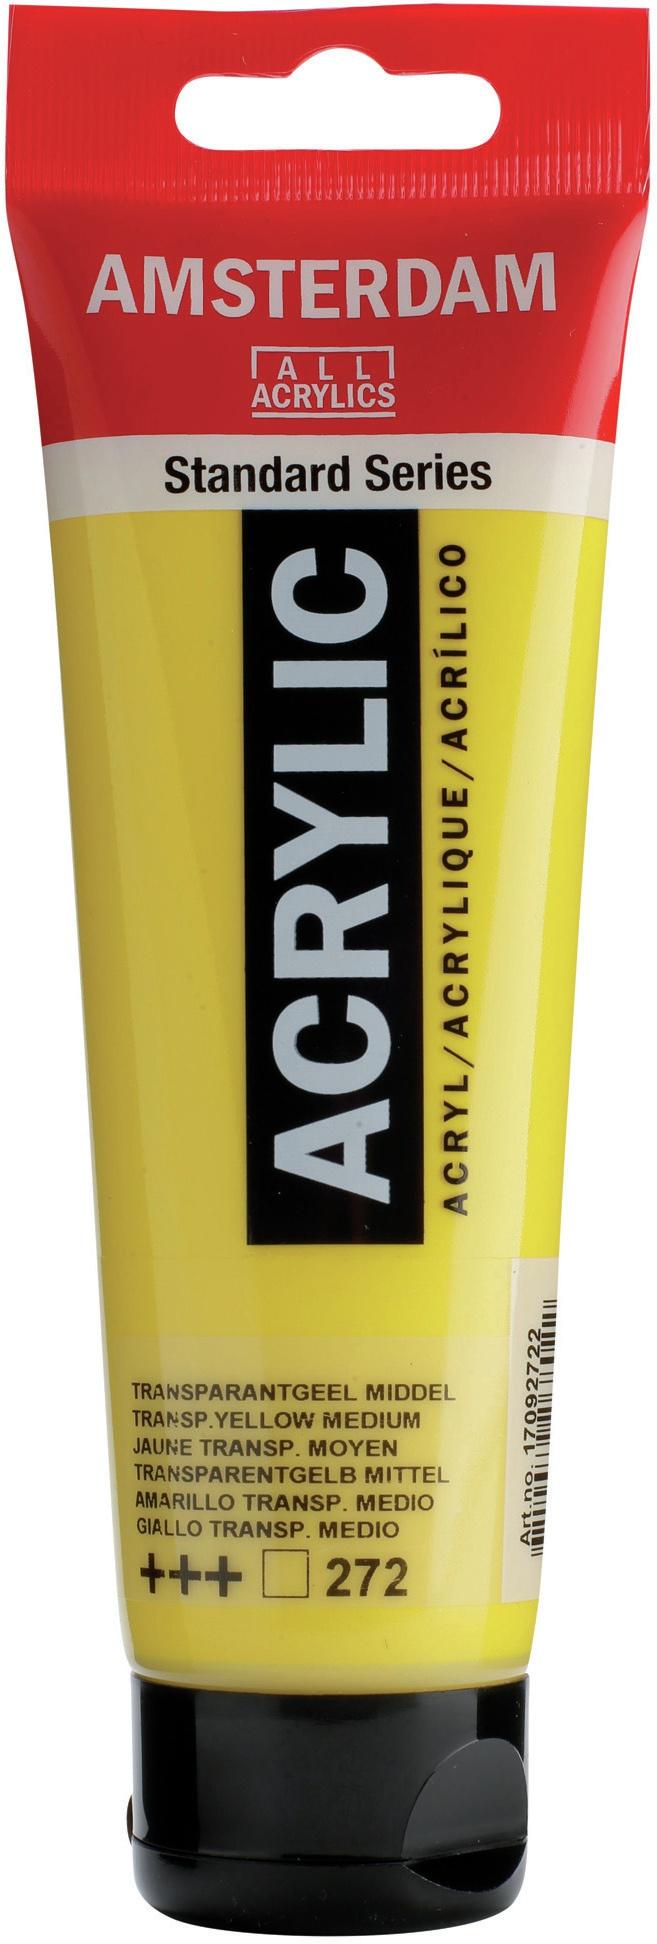 Amsterdam Standard Acrylic Paint 120ml-Titanium White